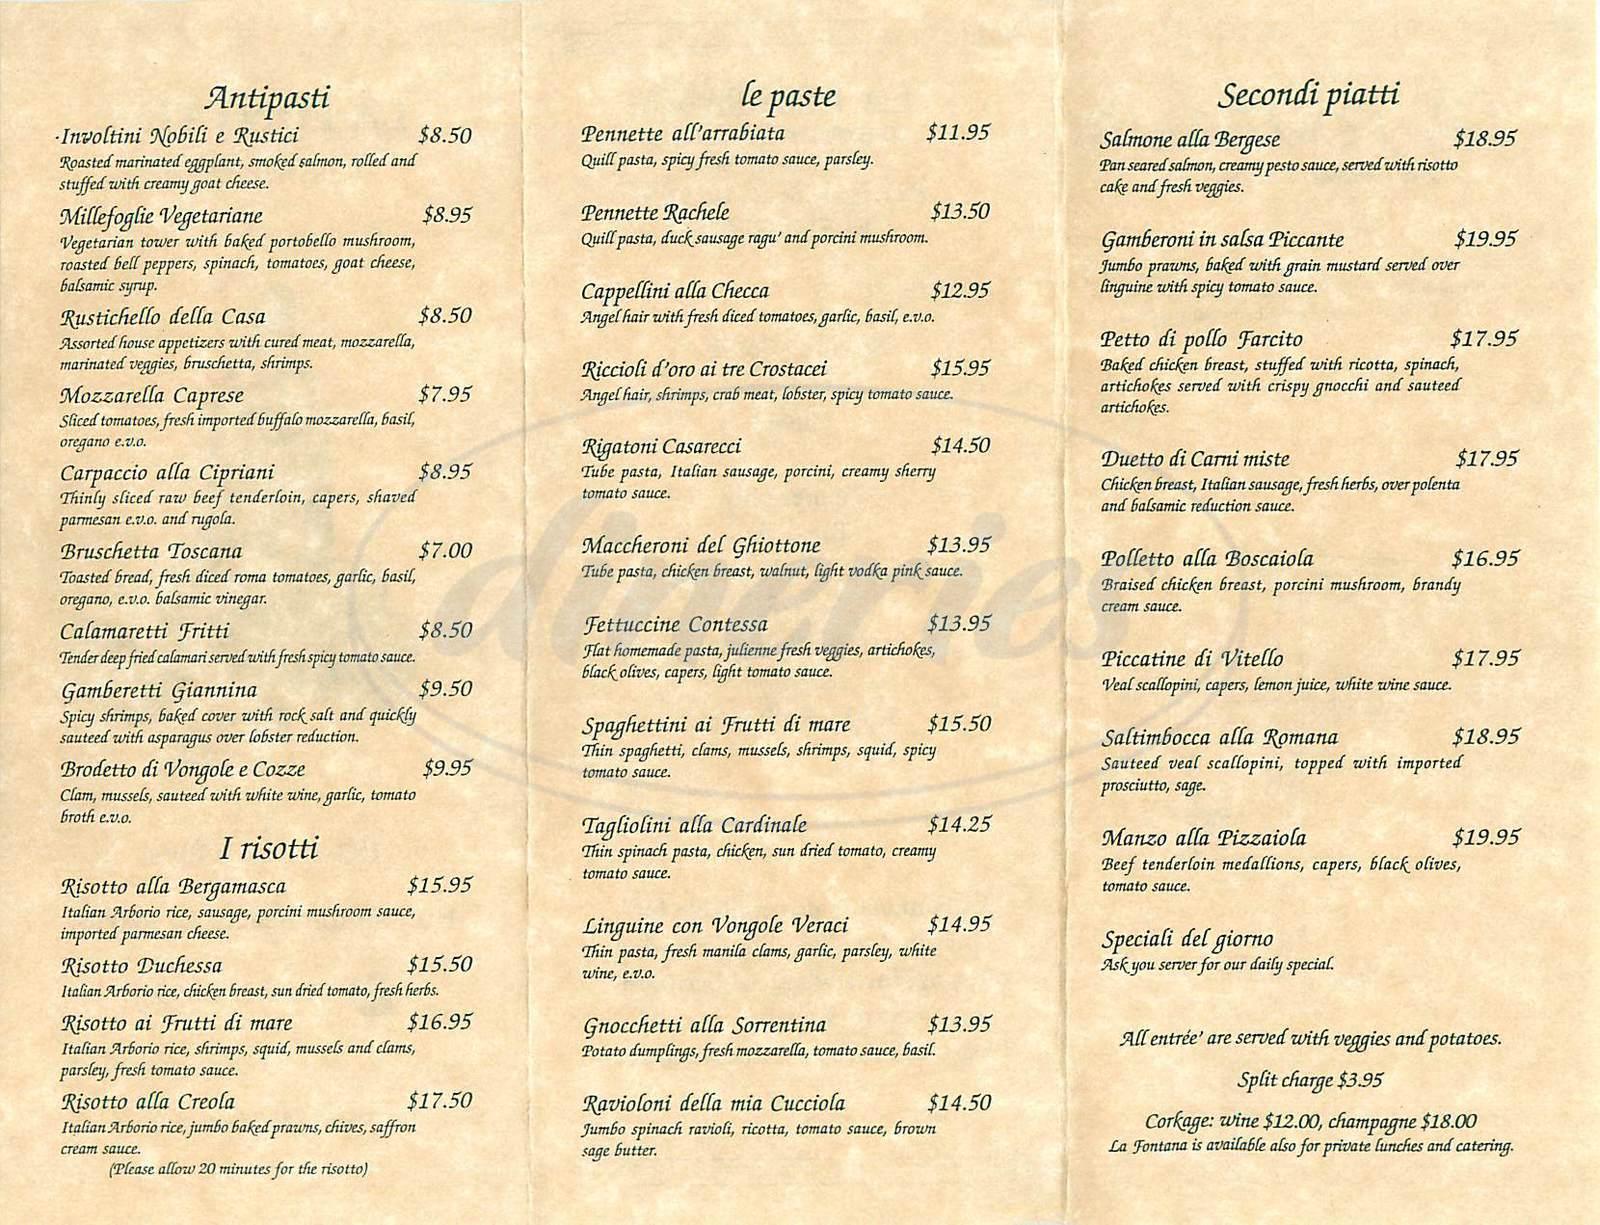 menu for La Fontana